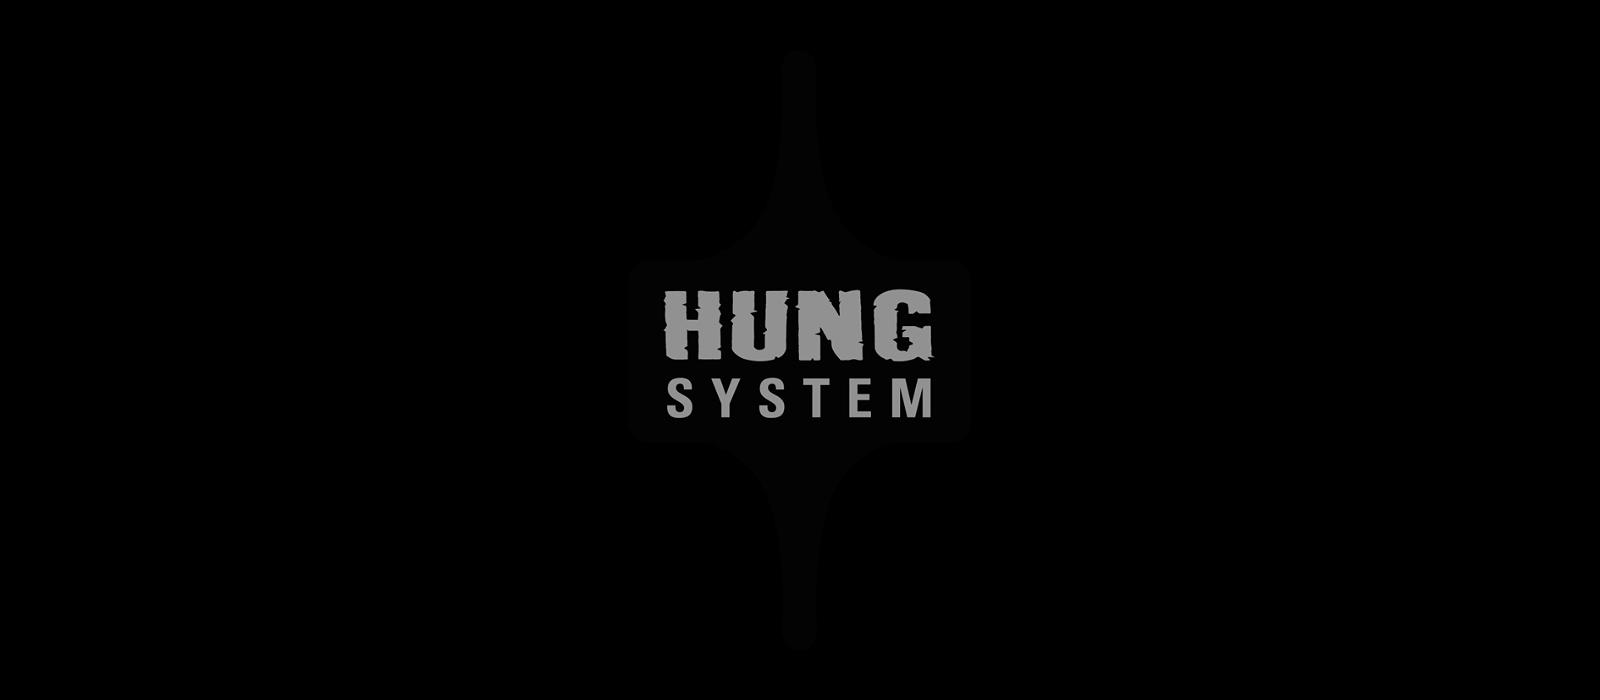 Hung System BP